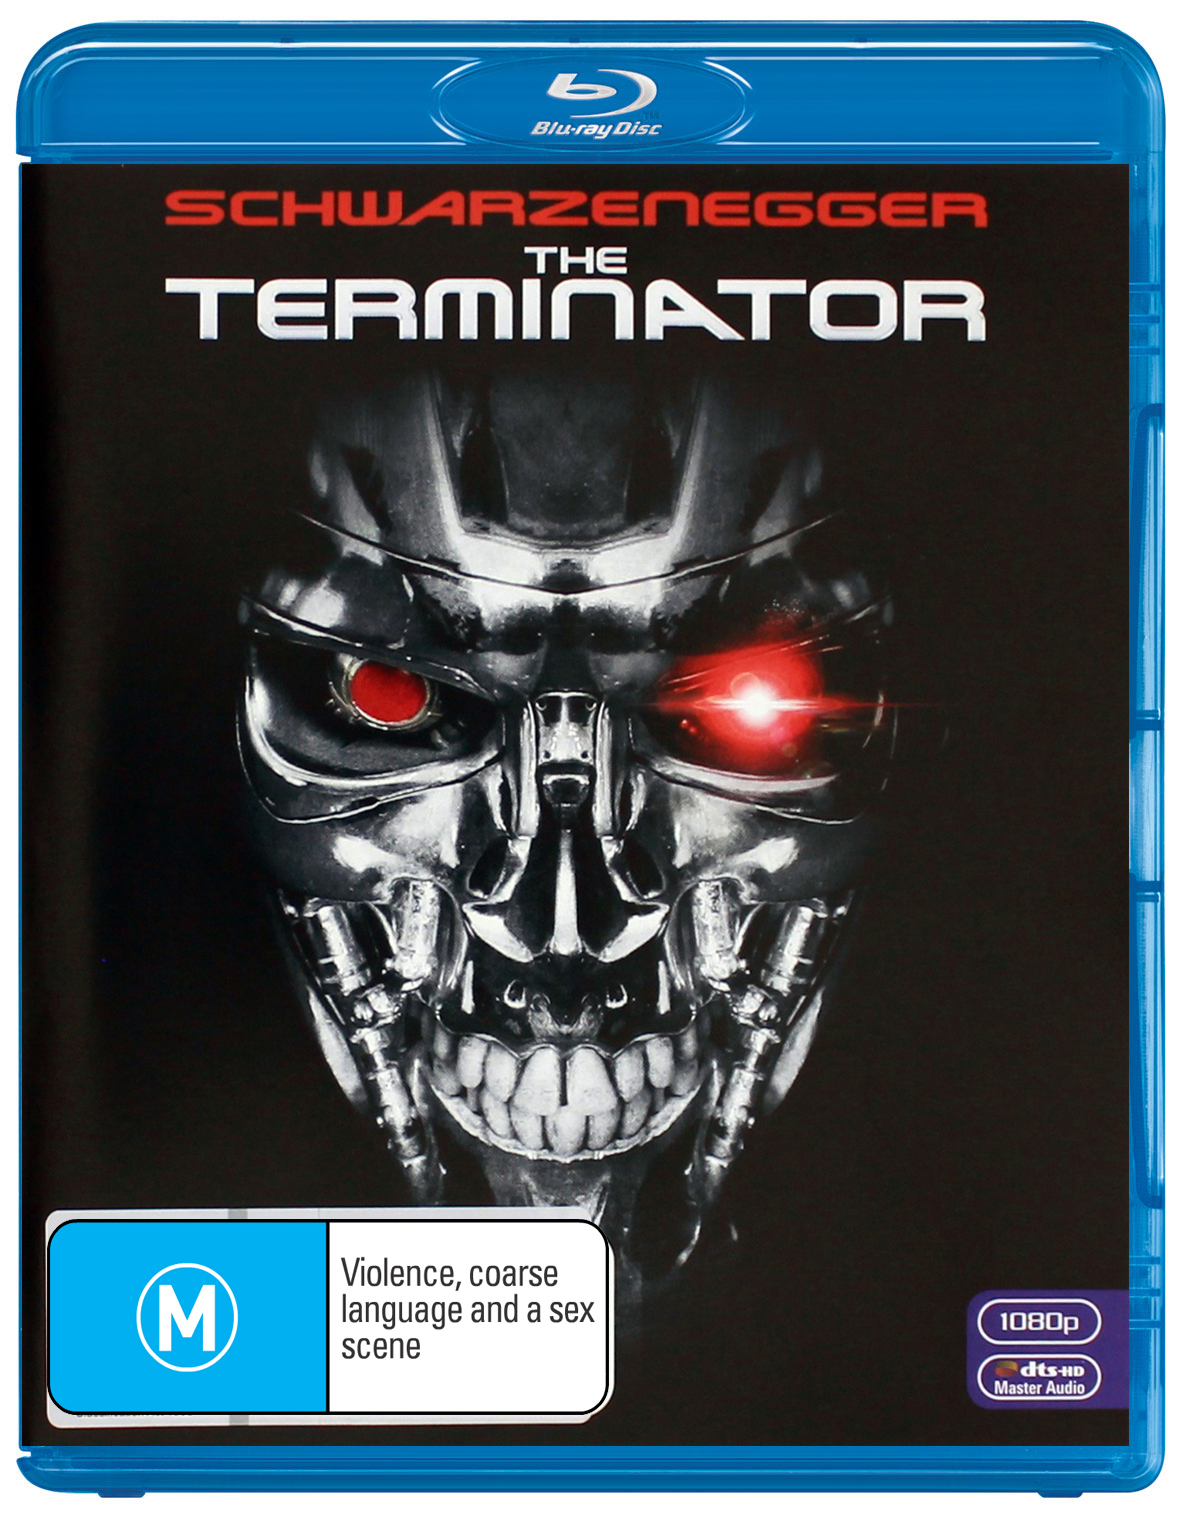 The Terminator on Blu-ray image